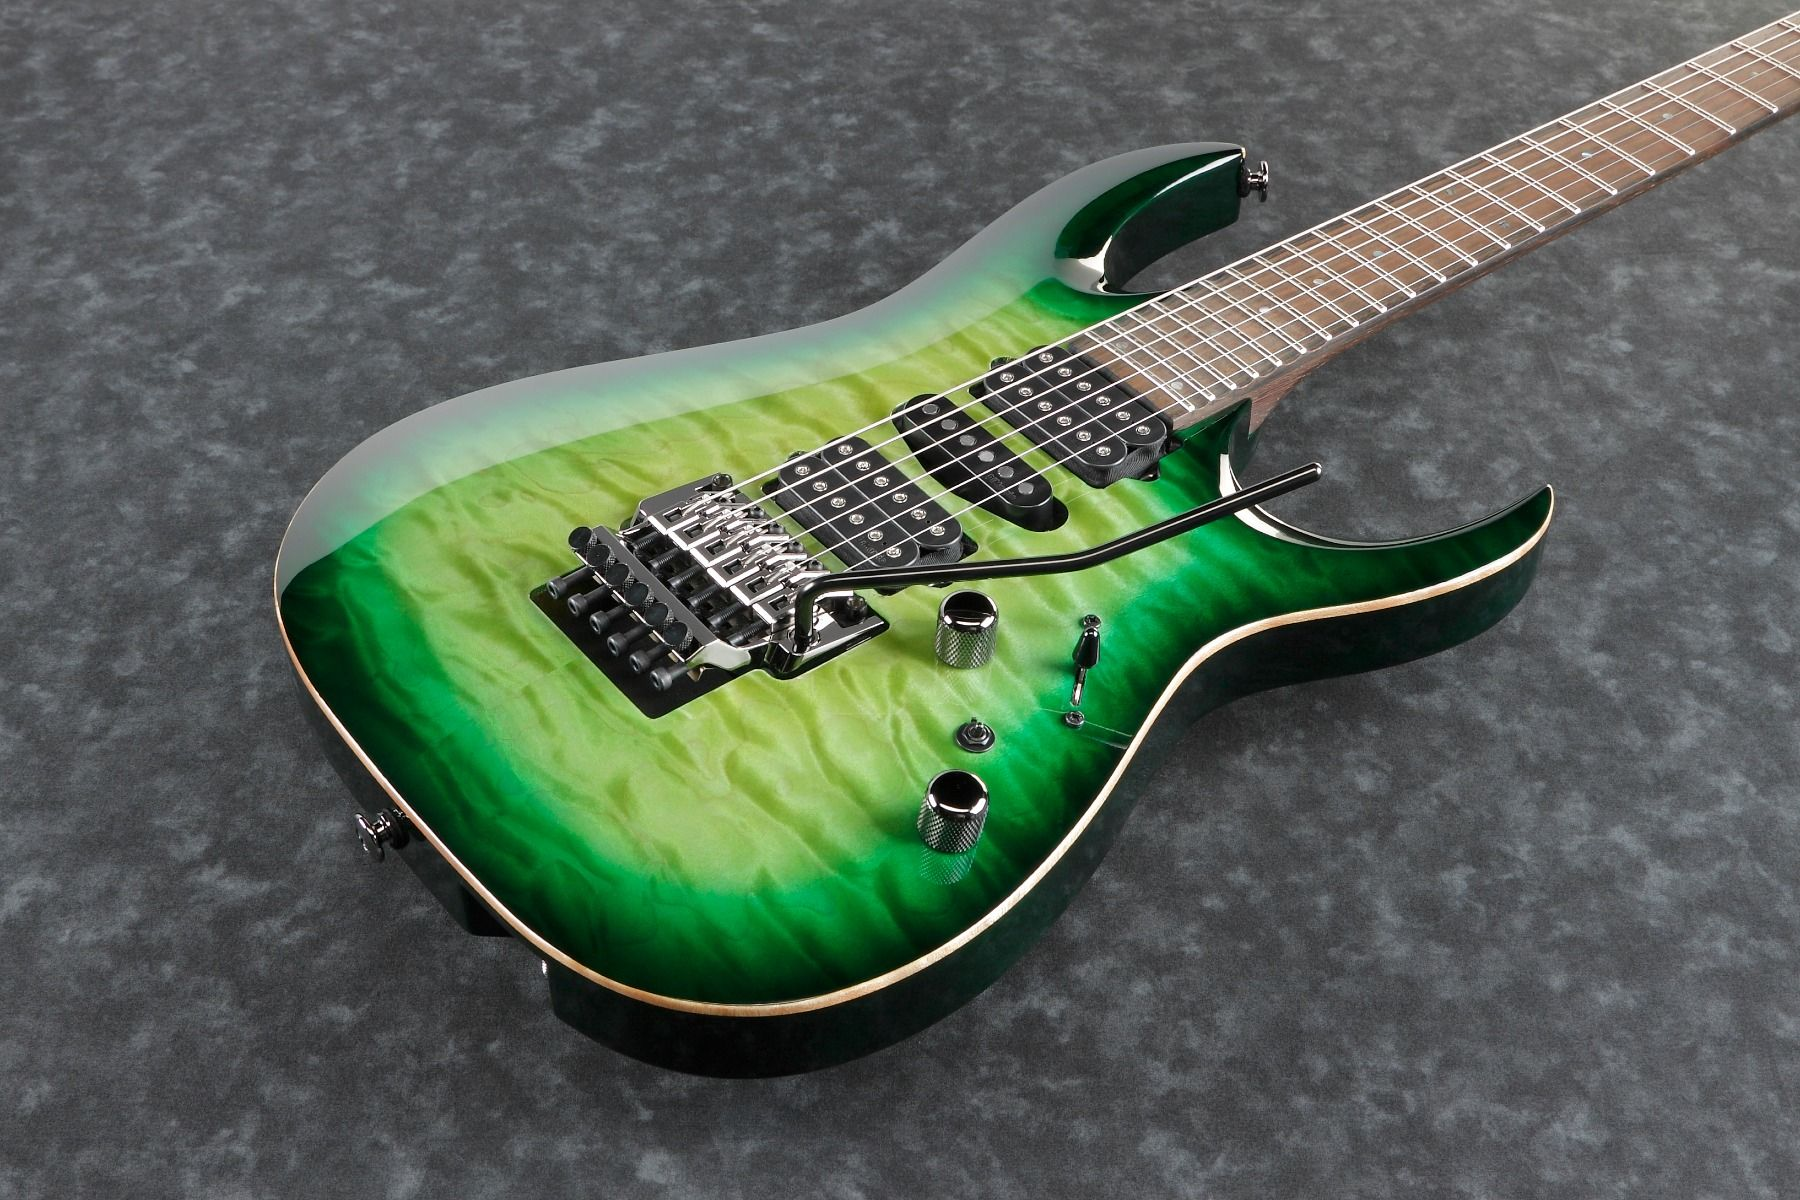 ibanez kiko loureiro signature w case green mist burst kiko200gmt electric guitar 6. Black Bedroom Furniture Sets. Home Design Ideas